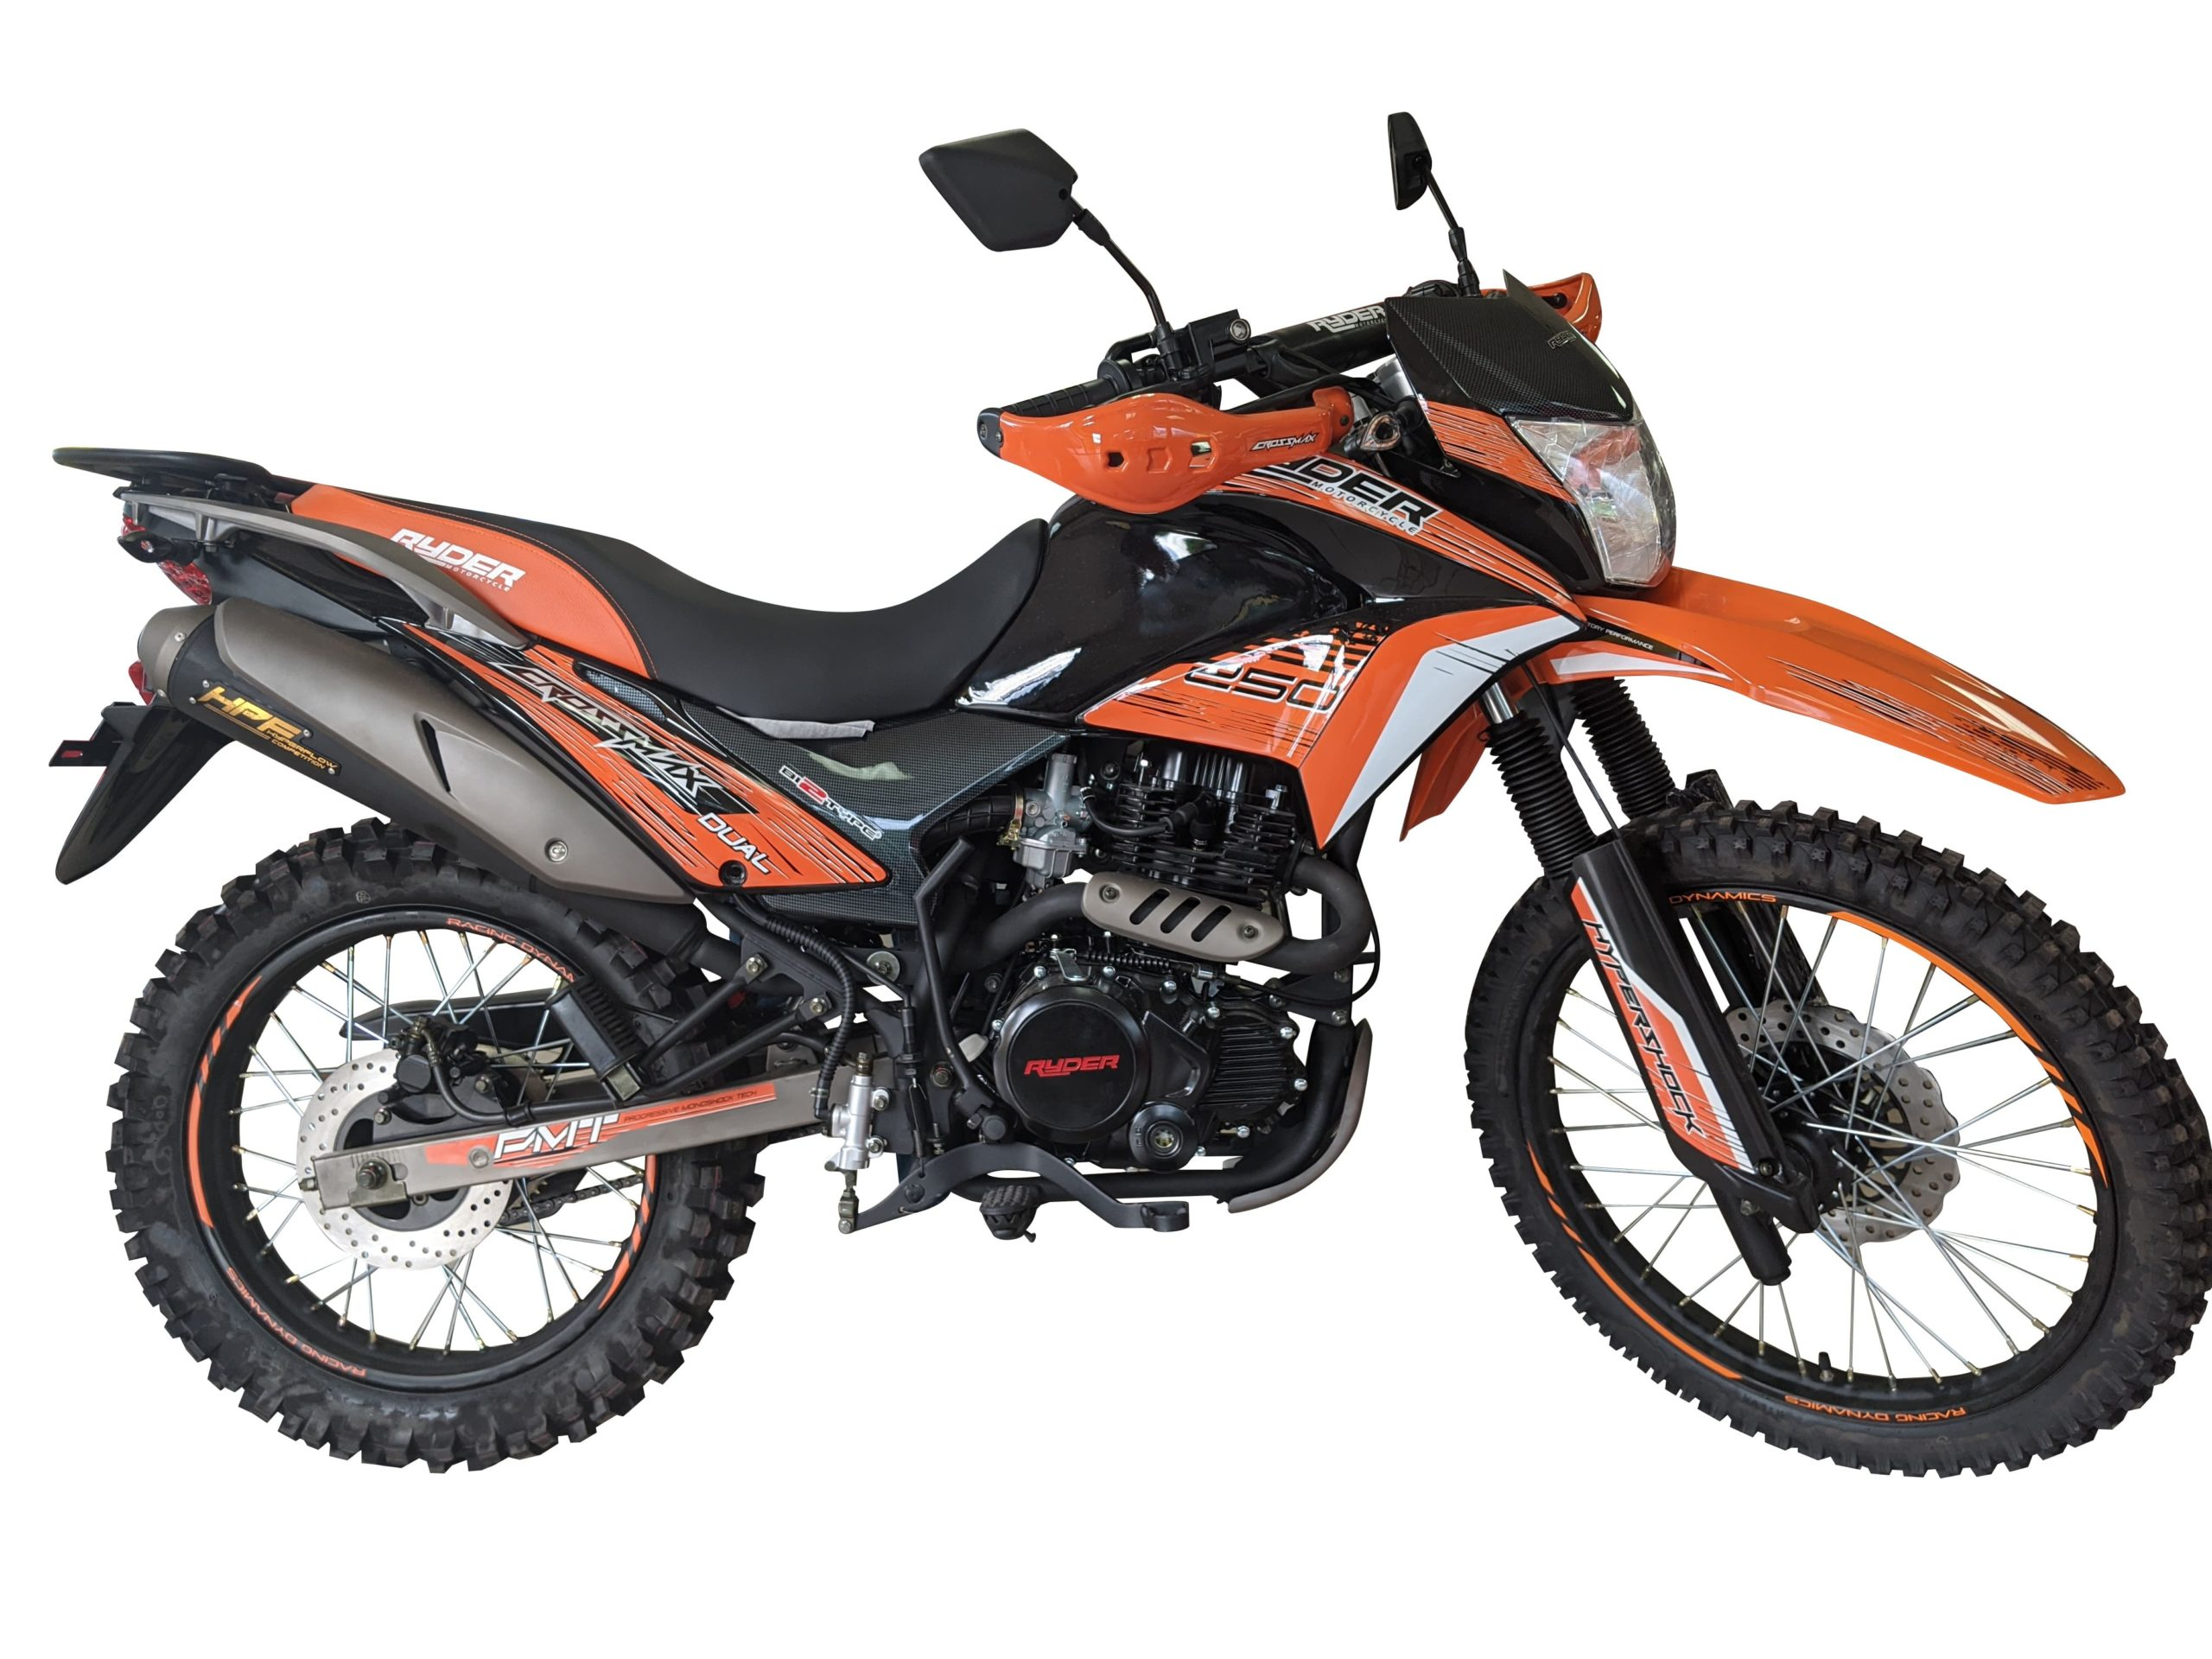 MOTO 250 RYDER HC250GY-CQ